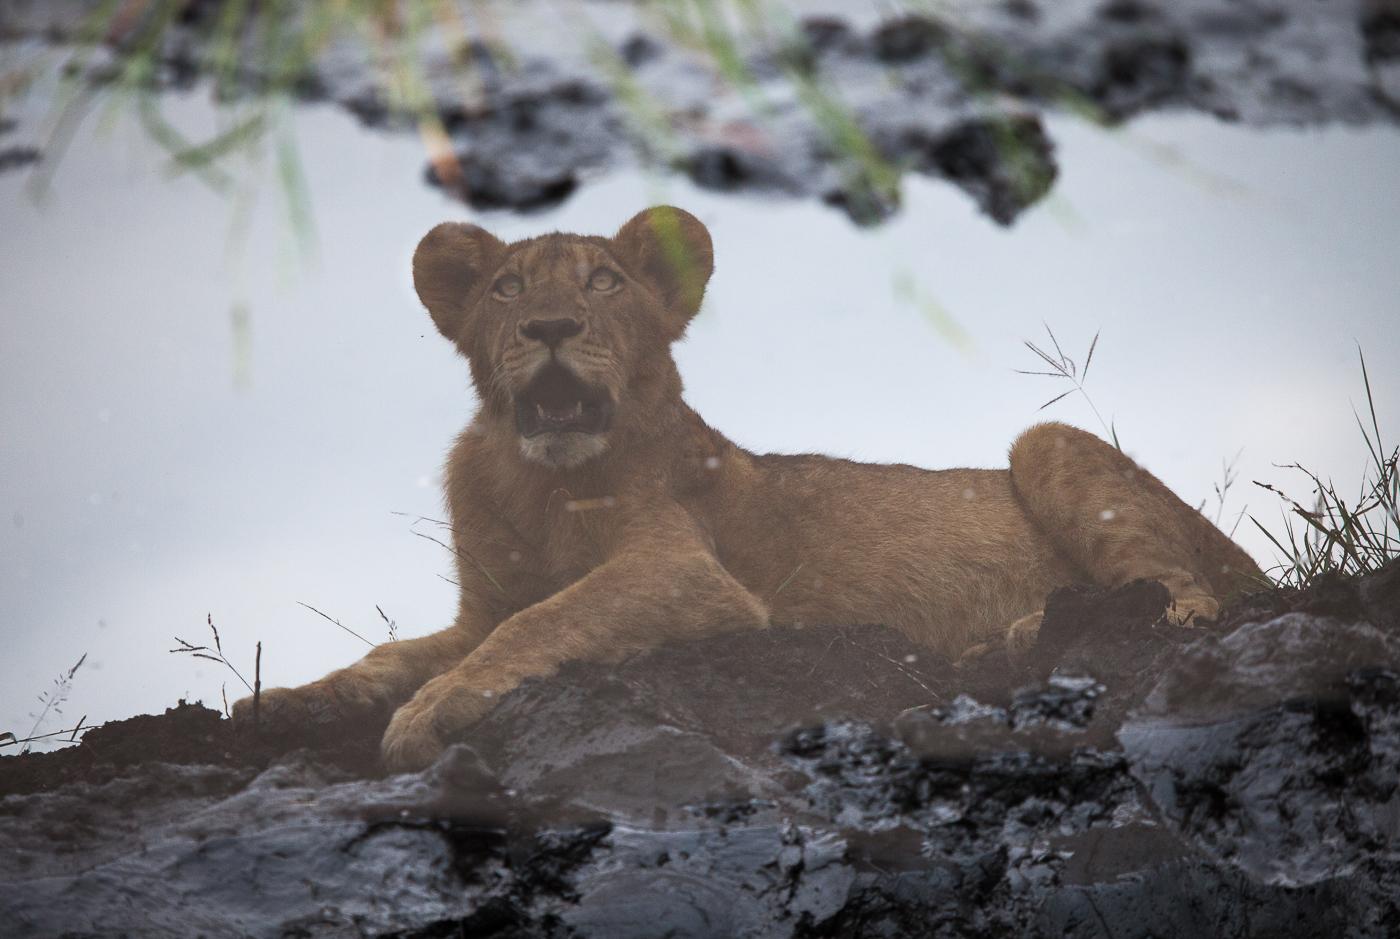 Mhangeni pride, lion cub, reflection, AA